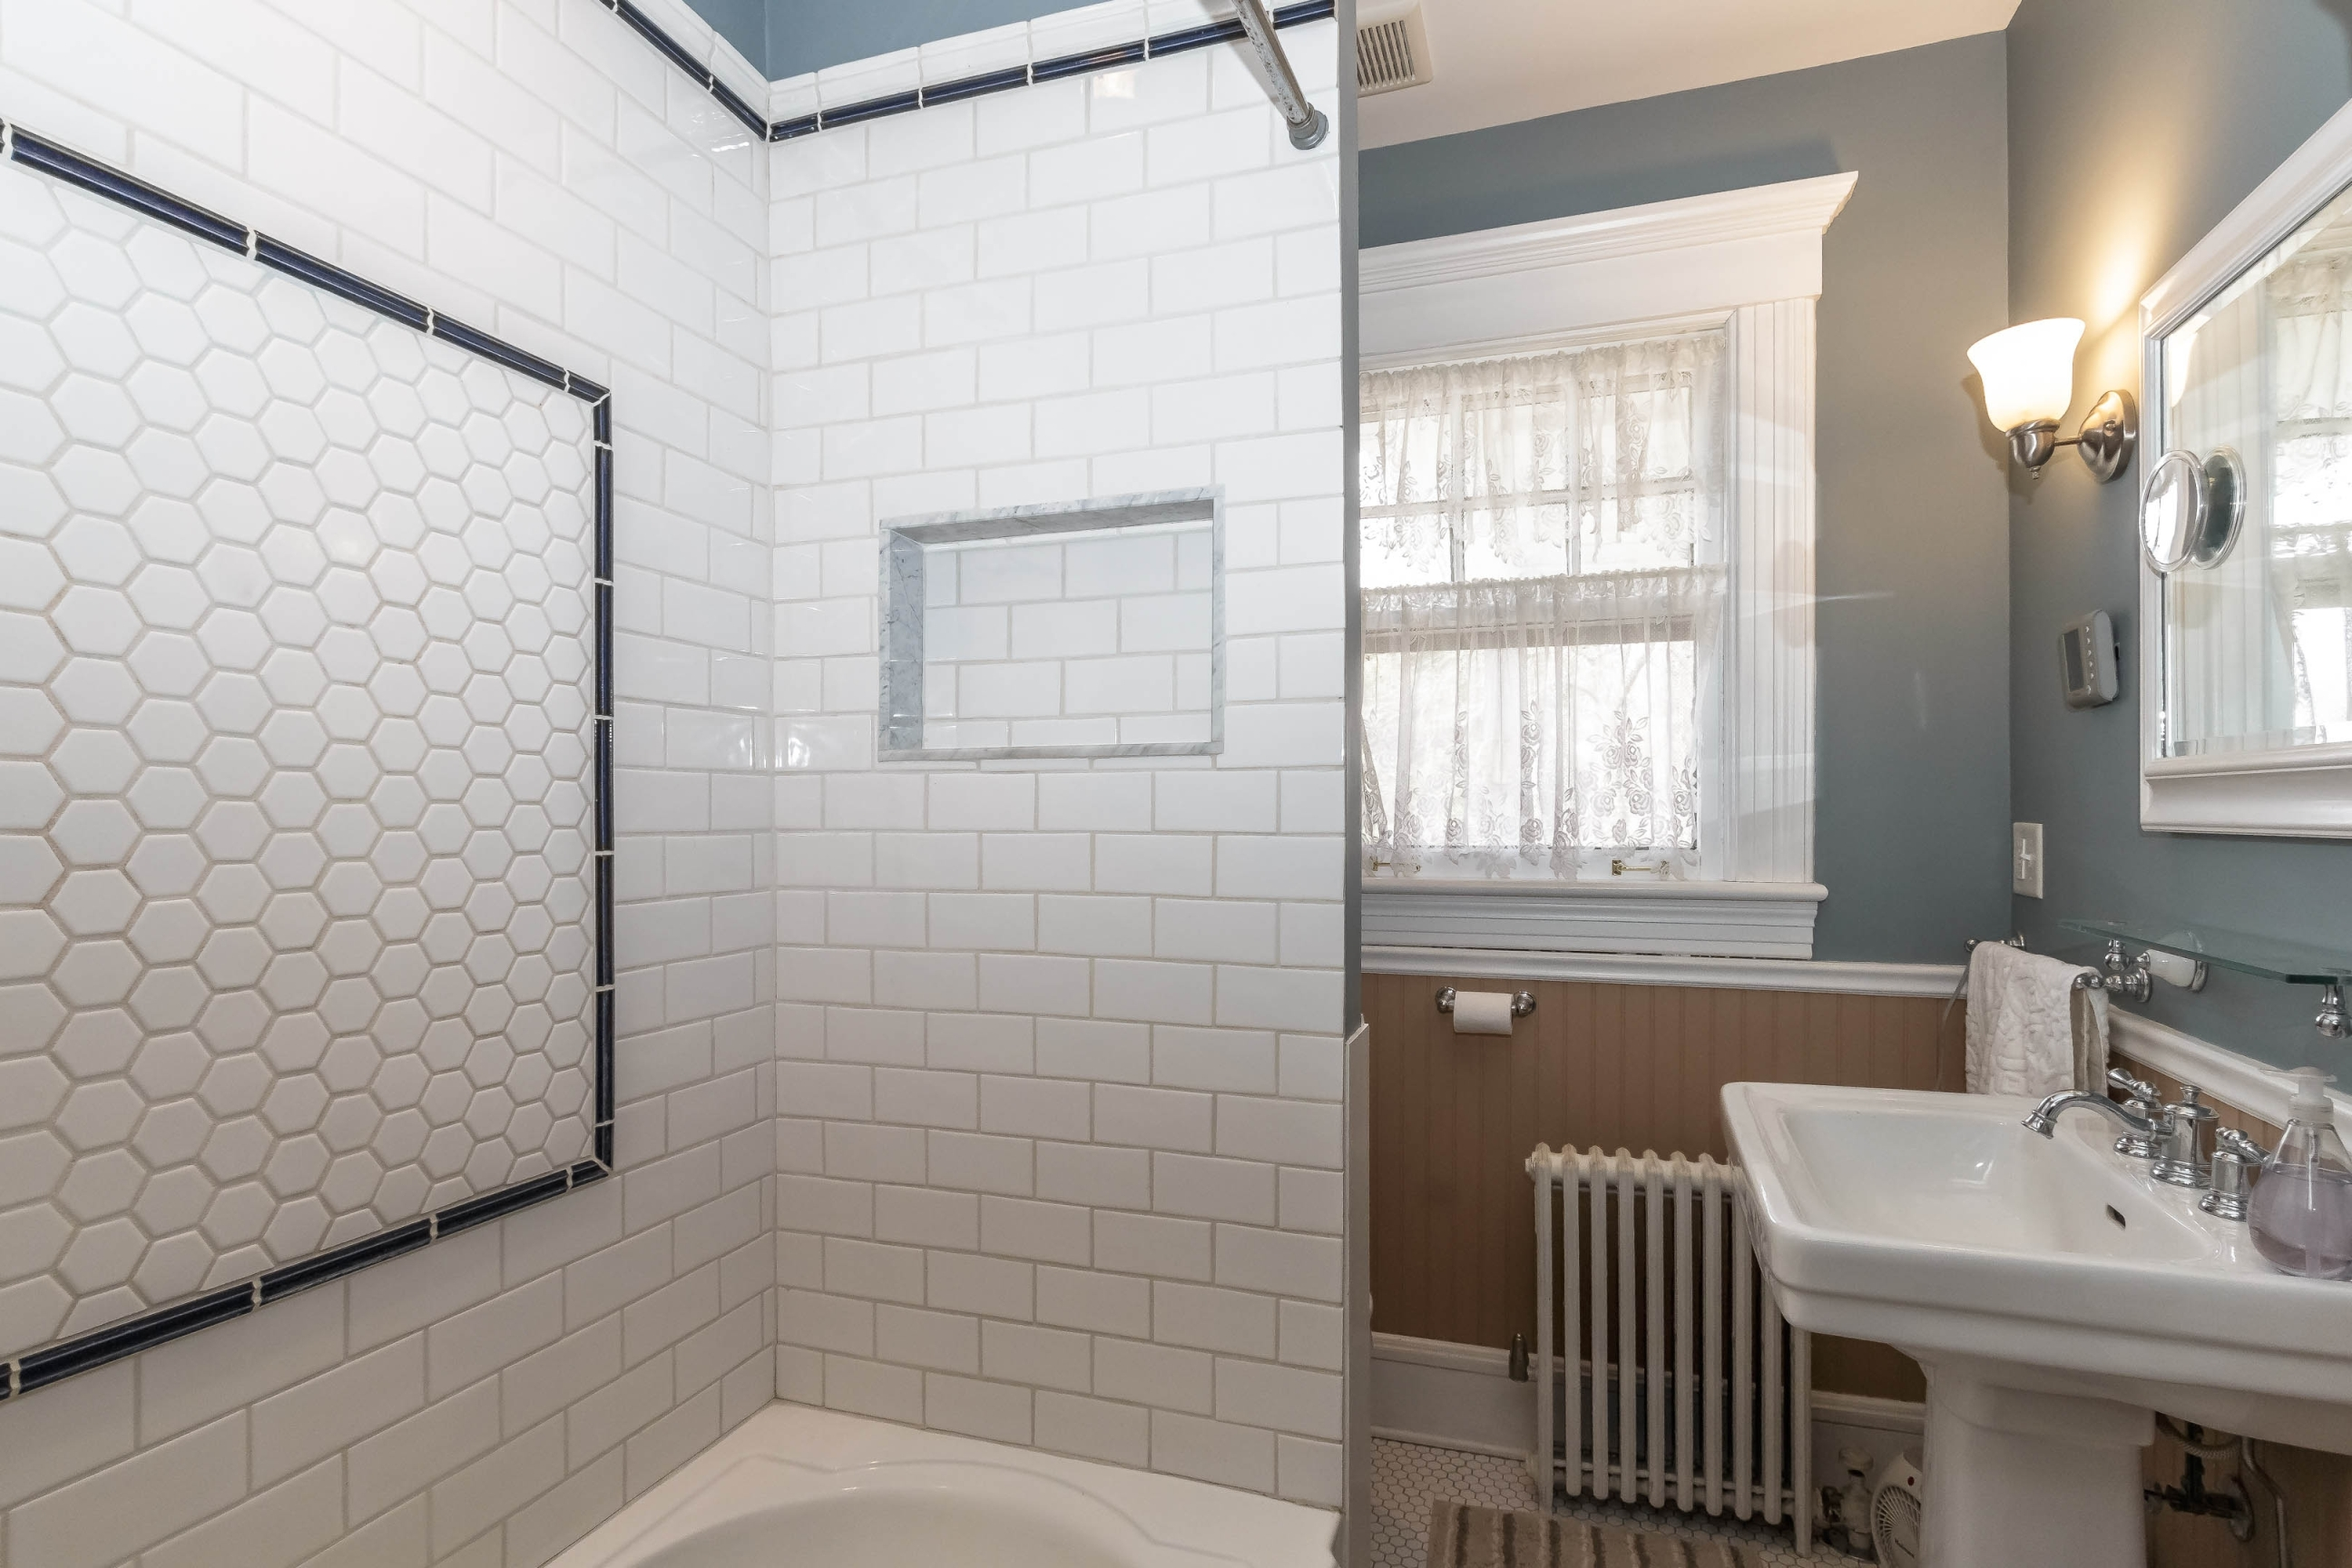 Before – Original Bathroom